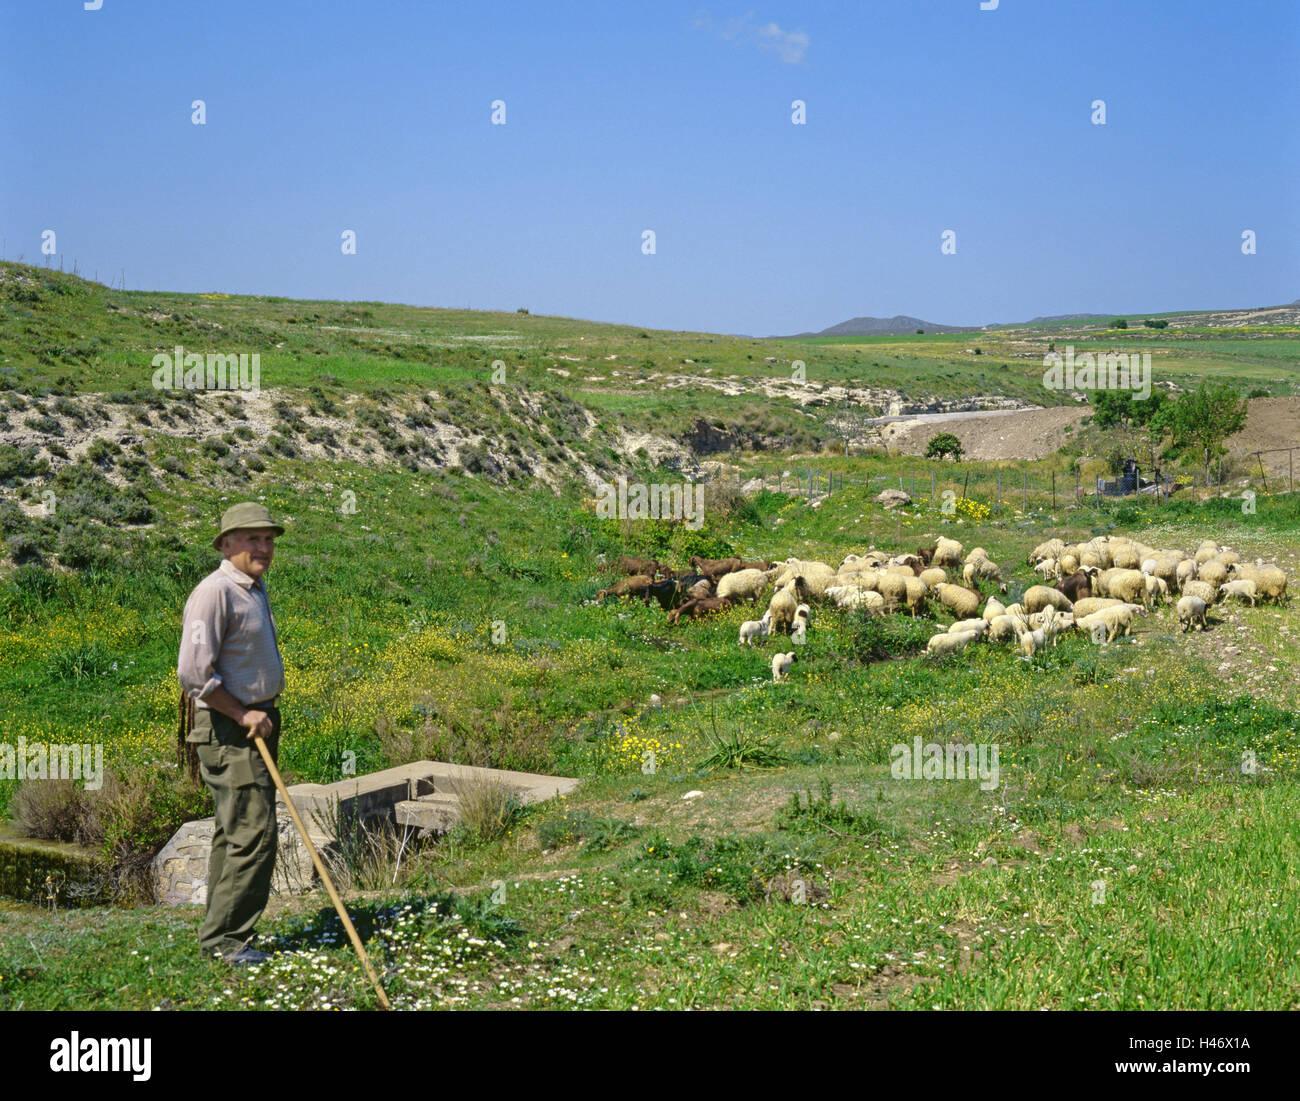 Cyprus, in Greek, pasture, flock of sheep, shepherd, no model release, Europe, Mediterranean island, island, island - Stock Image